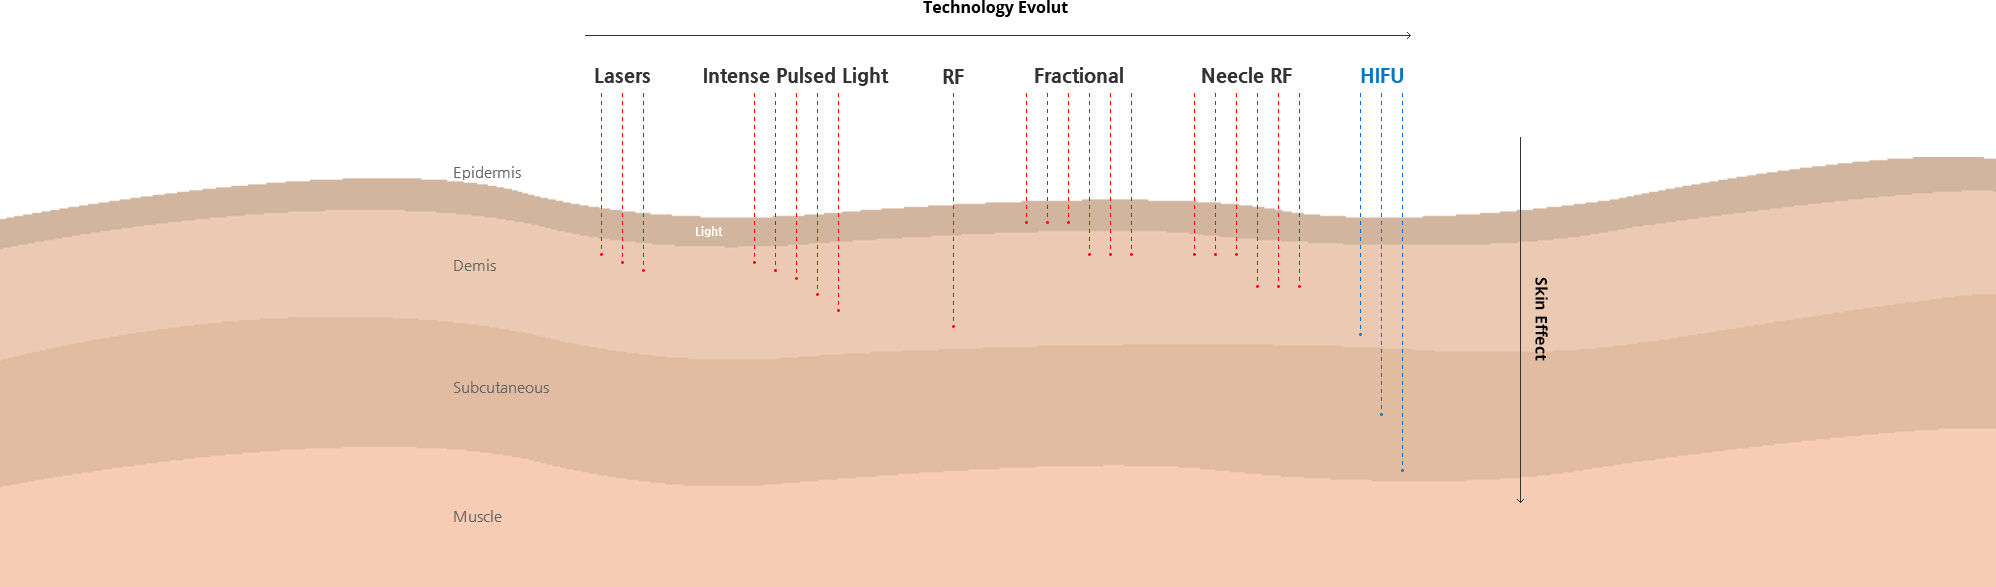 Unstable HIFU energy that causes burns vs e.l.k Utims (TM) stable HIFU energy